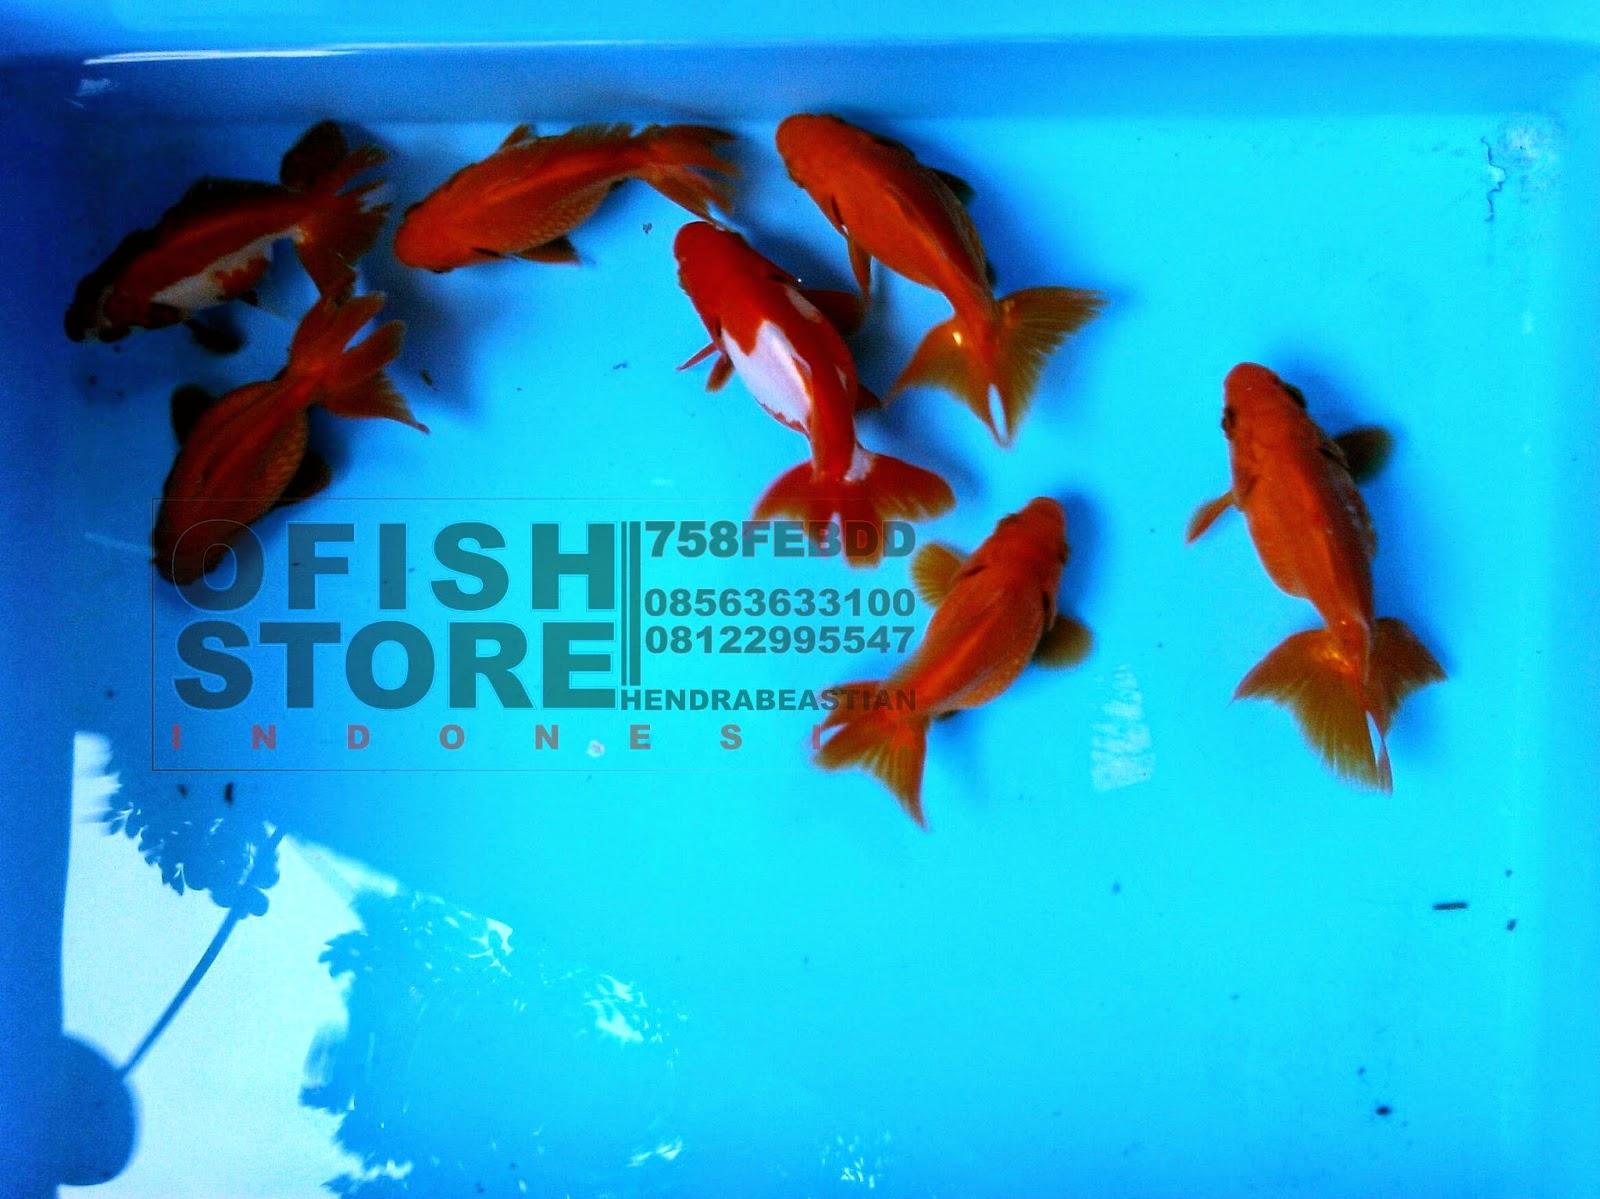 Jual Ikan Hias Cupang Jual Ikan Hias Guppy Jual Ikan Hias Koi